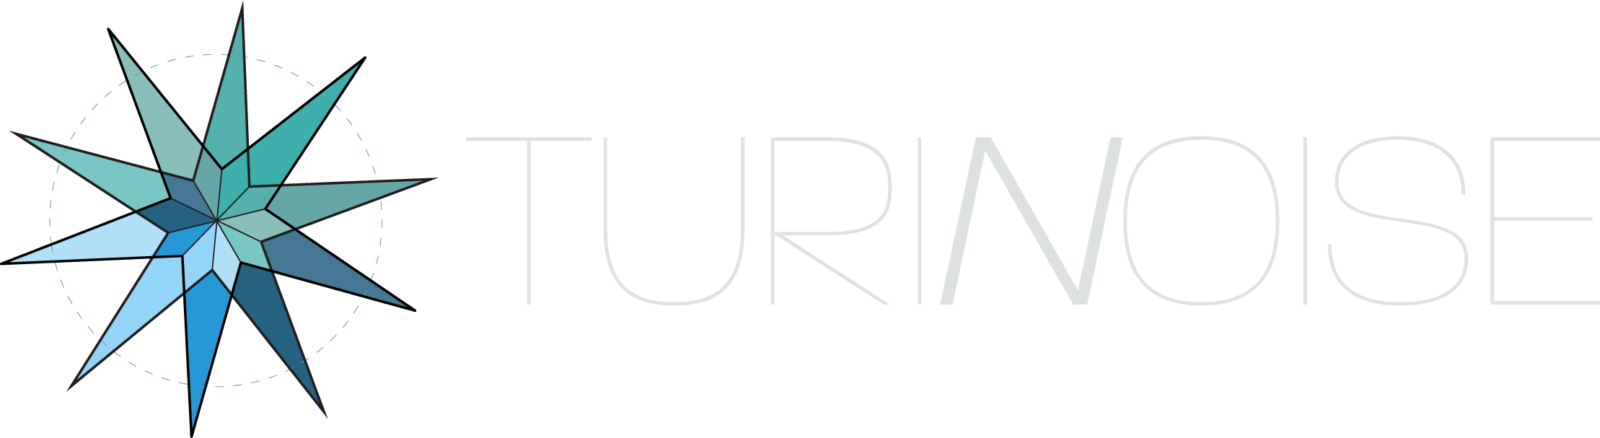 Turinoise